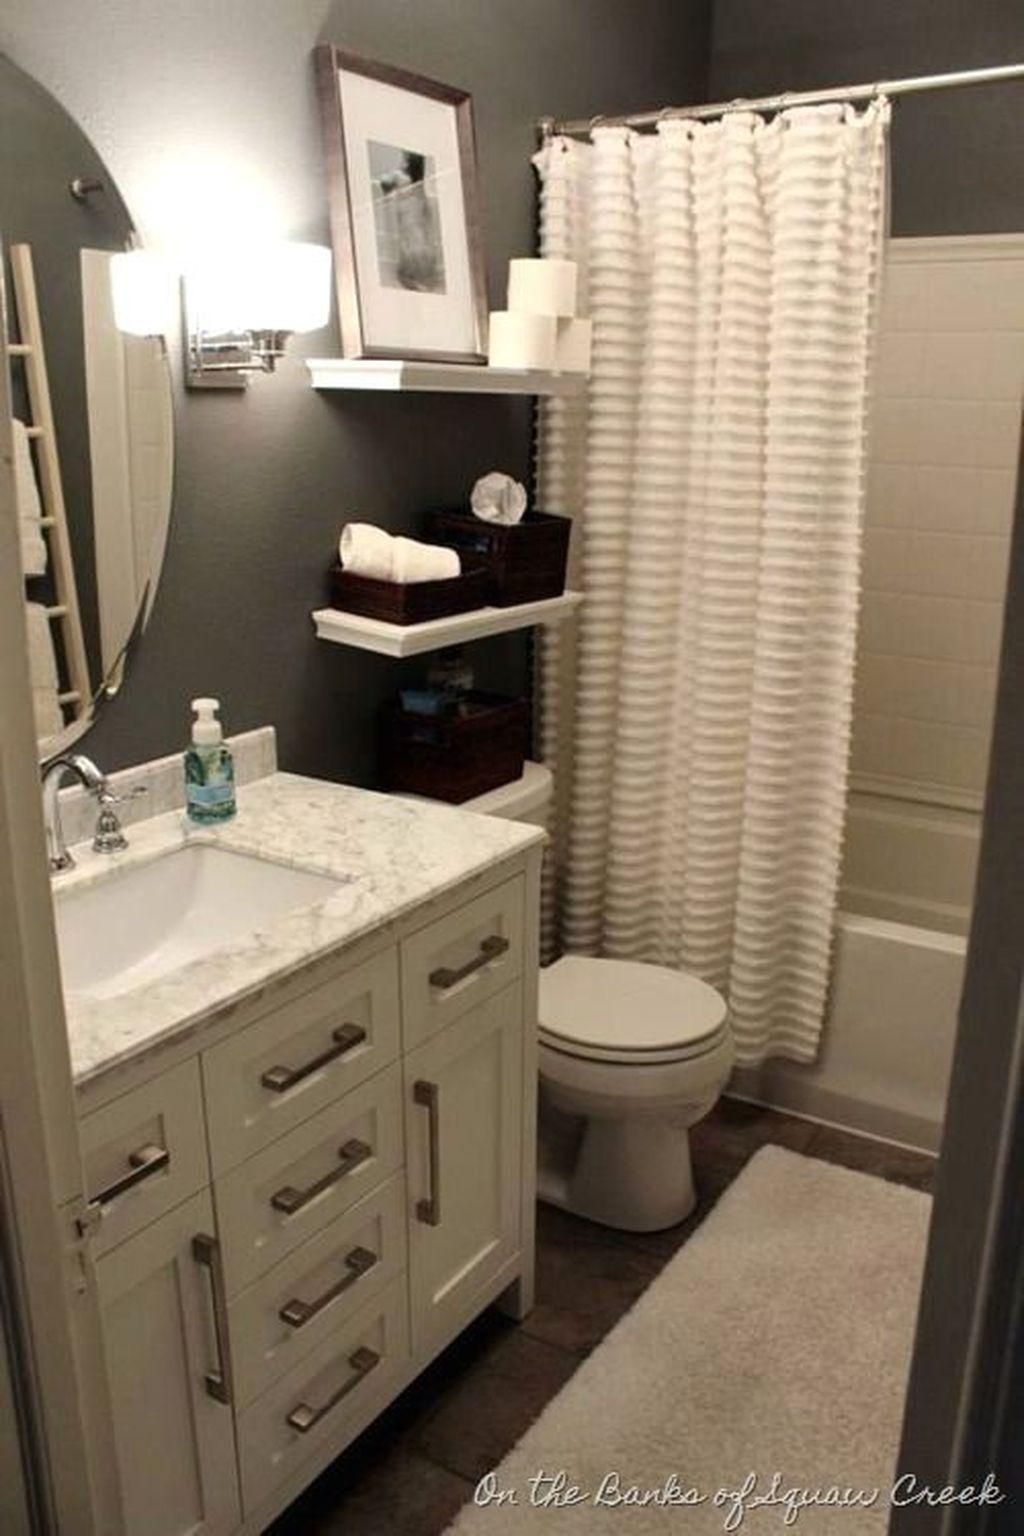 Amazing Bathroom Design Ideas For Small Space 47 Bathroom Design Small Small Bathroom Remodel Small Bathroom Decor